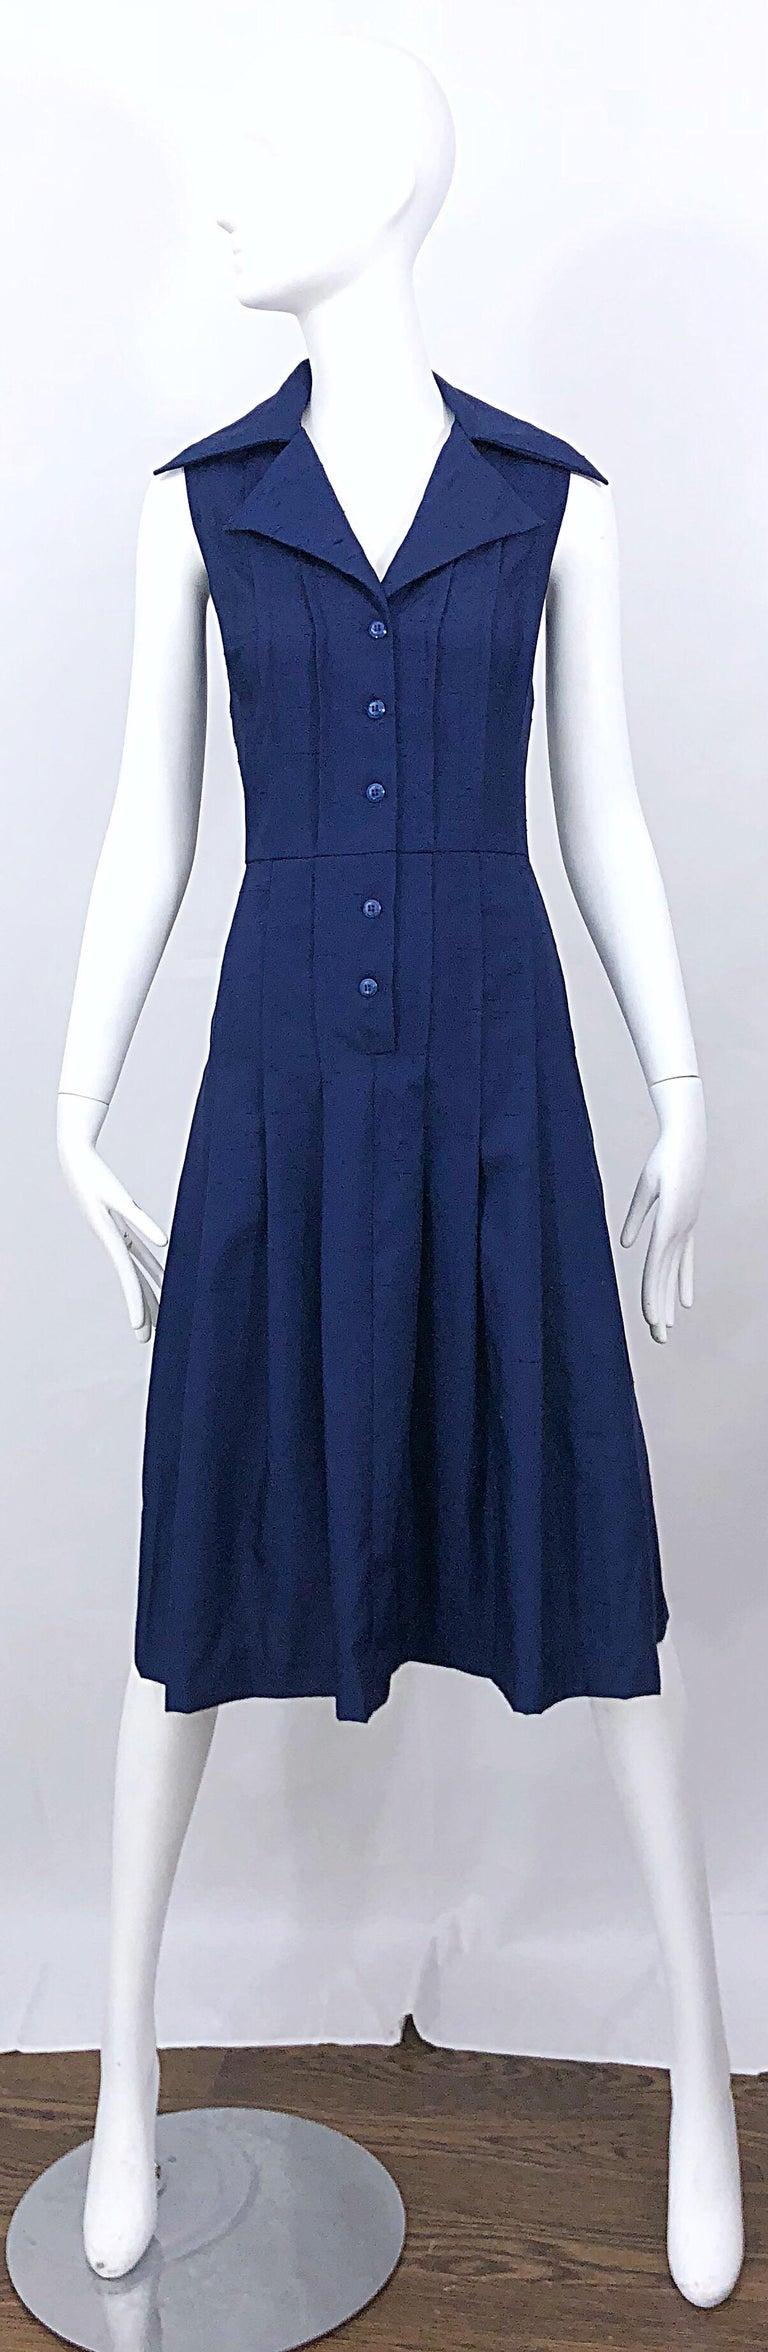 1990s Saks 5th Avenue Size 10 Navy Blue Silk Vintage 90s Sleeveless Shirt Dress For Sale 12